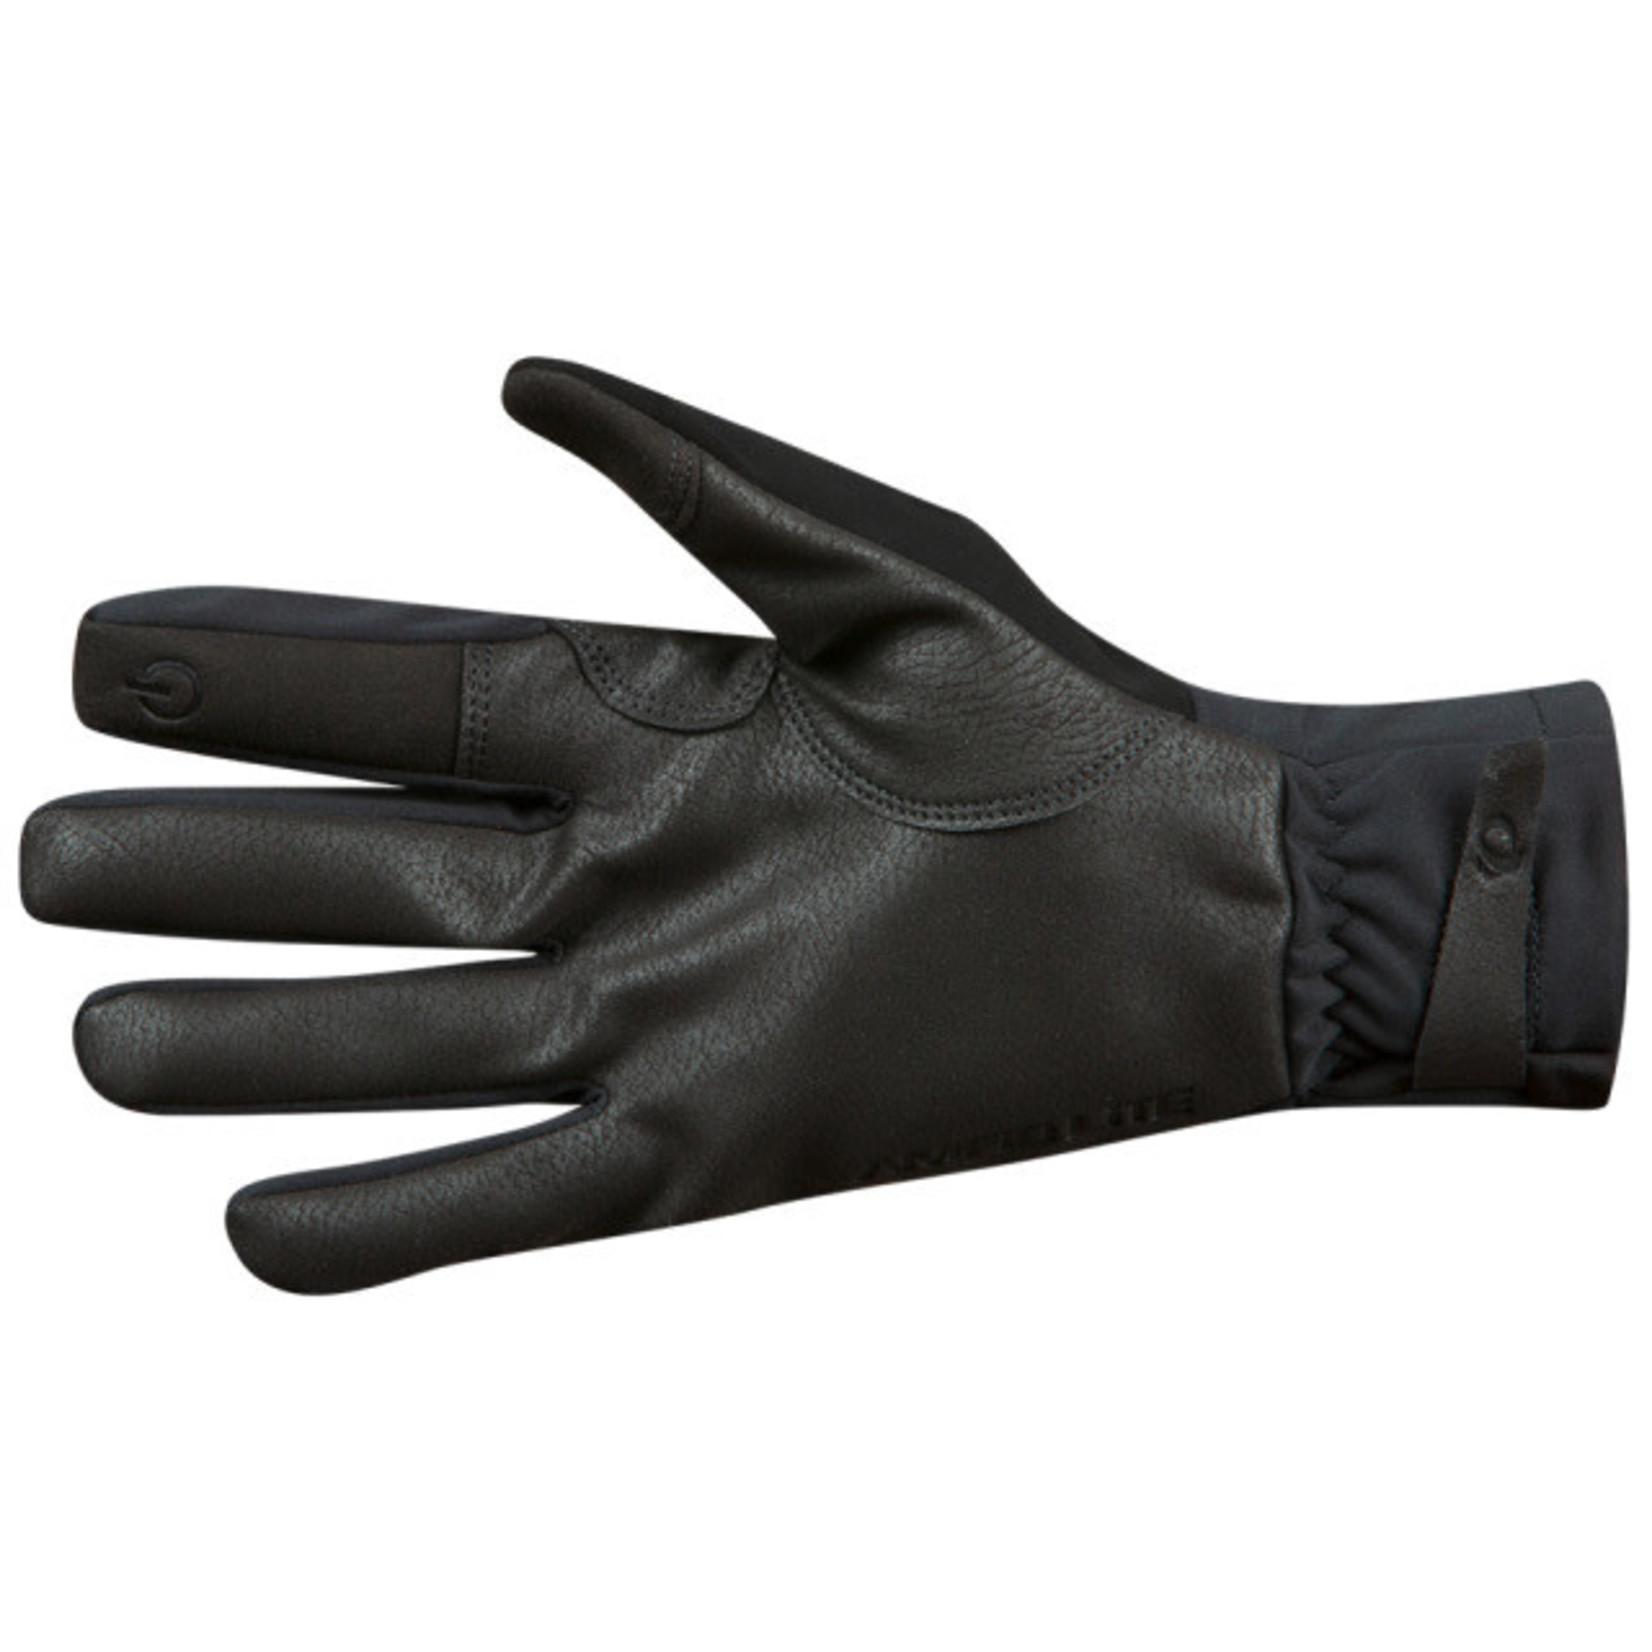 Pearl iZUMi PEARL iZUMi - Handschuhe AmFIB Lite - Black